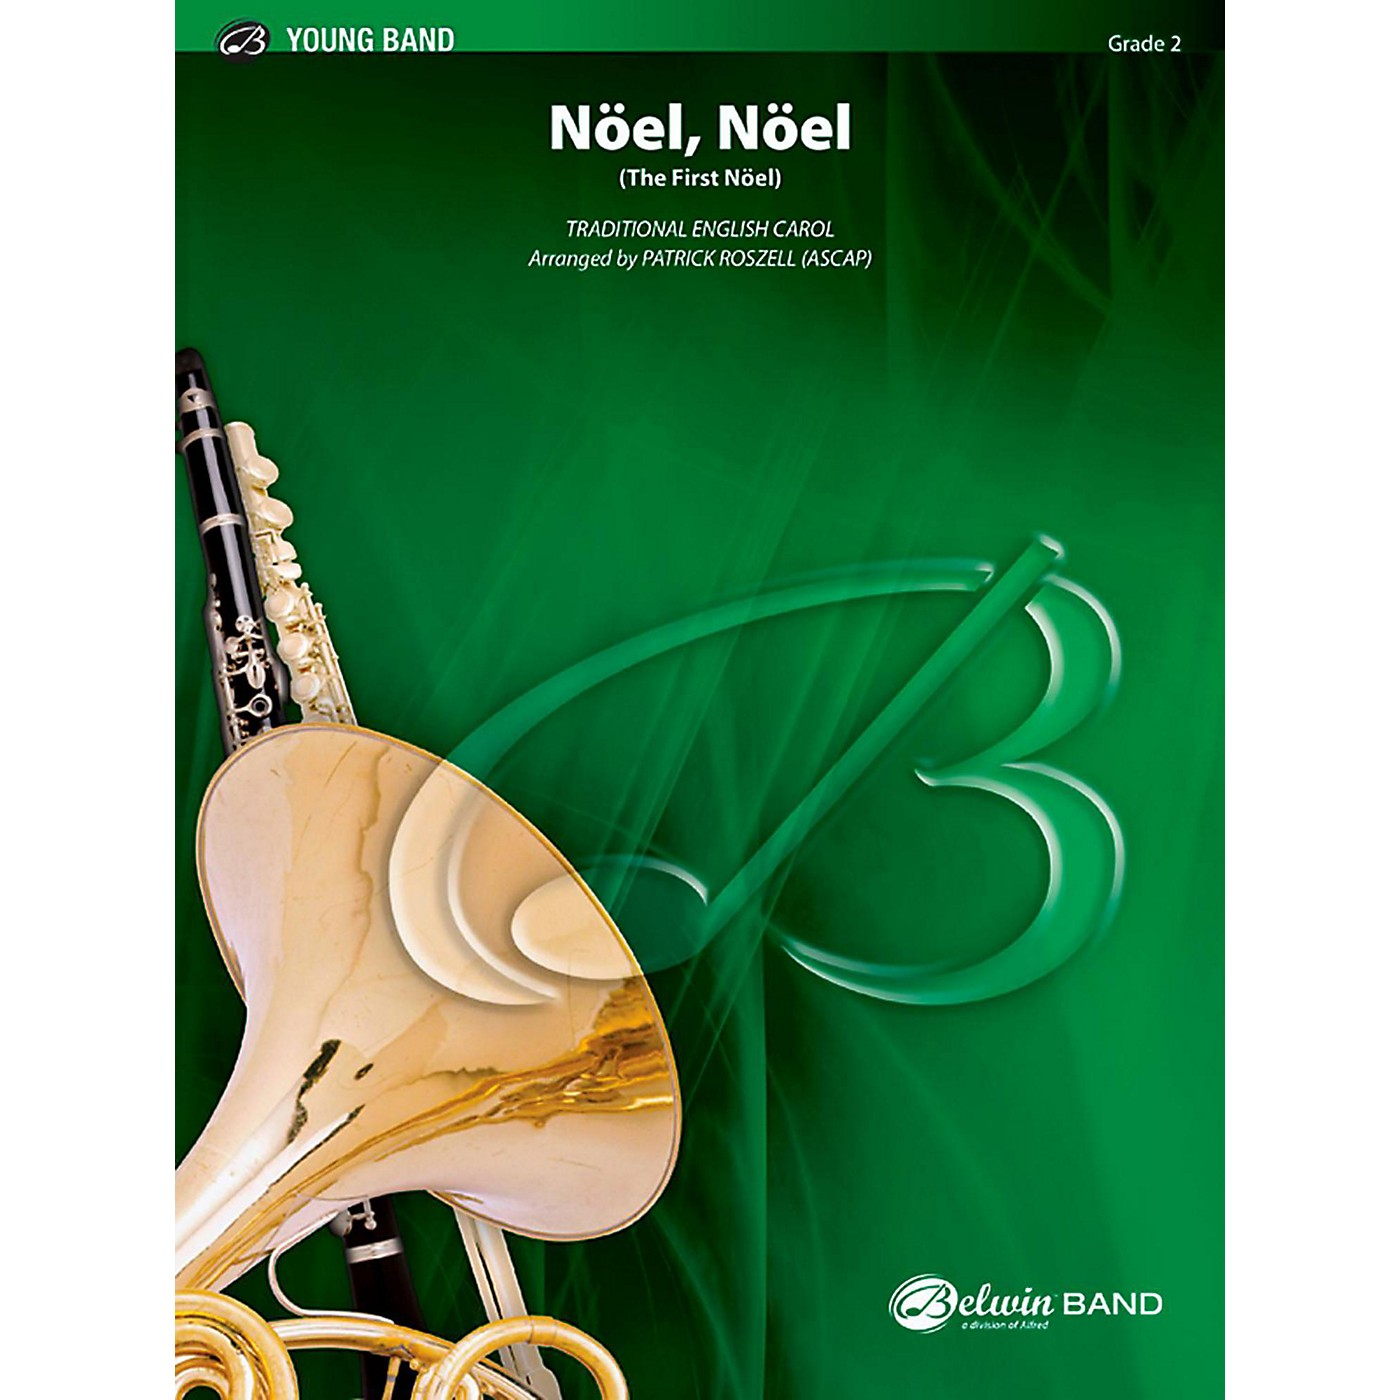 BELWIN Noel, Noel Concert Band Grade 2 (Easy) thumbnail